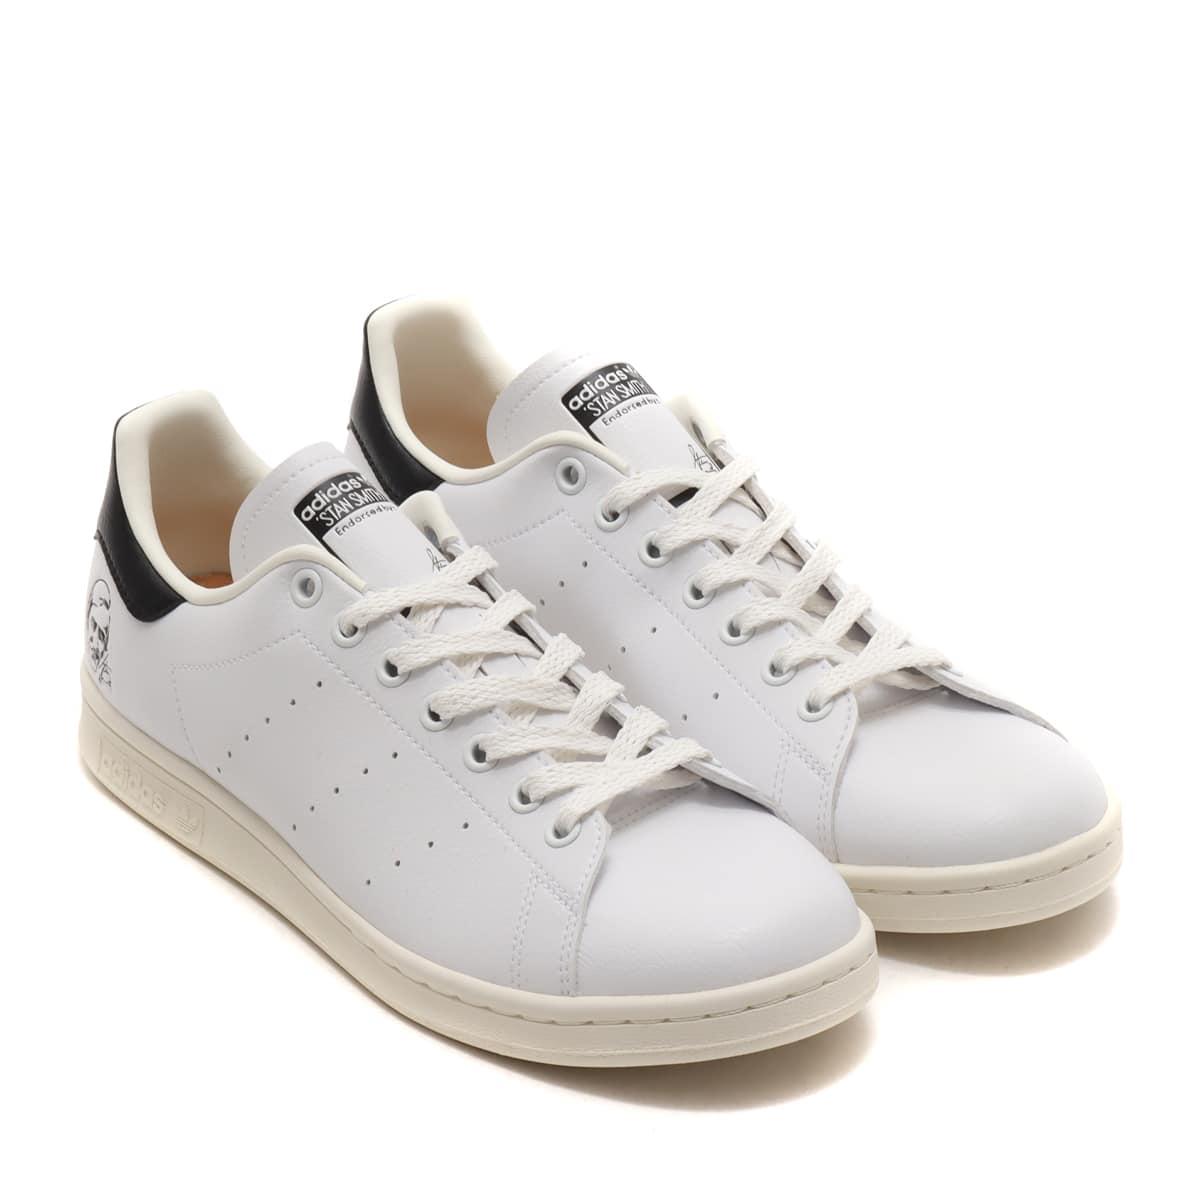 adidas STAN SMITH OFF WHITE /FOOTWEAR WHITE/CORE BLACK 21SS-I_photo_large